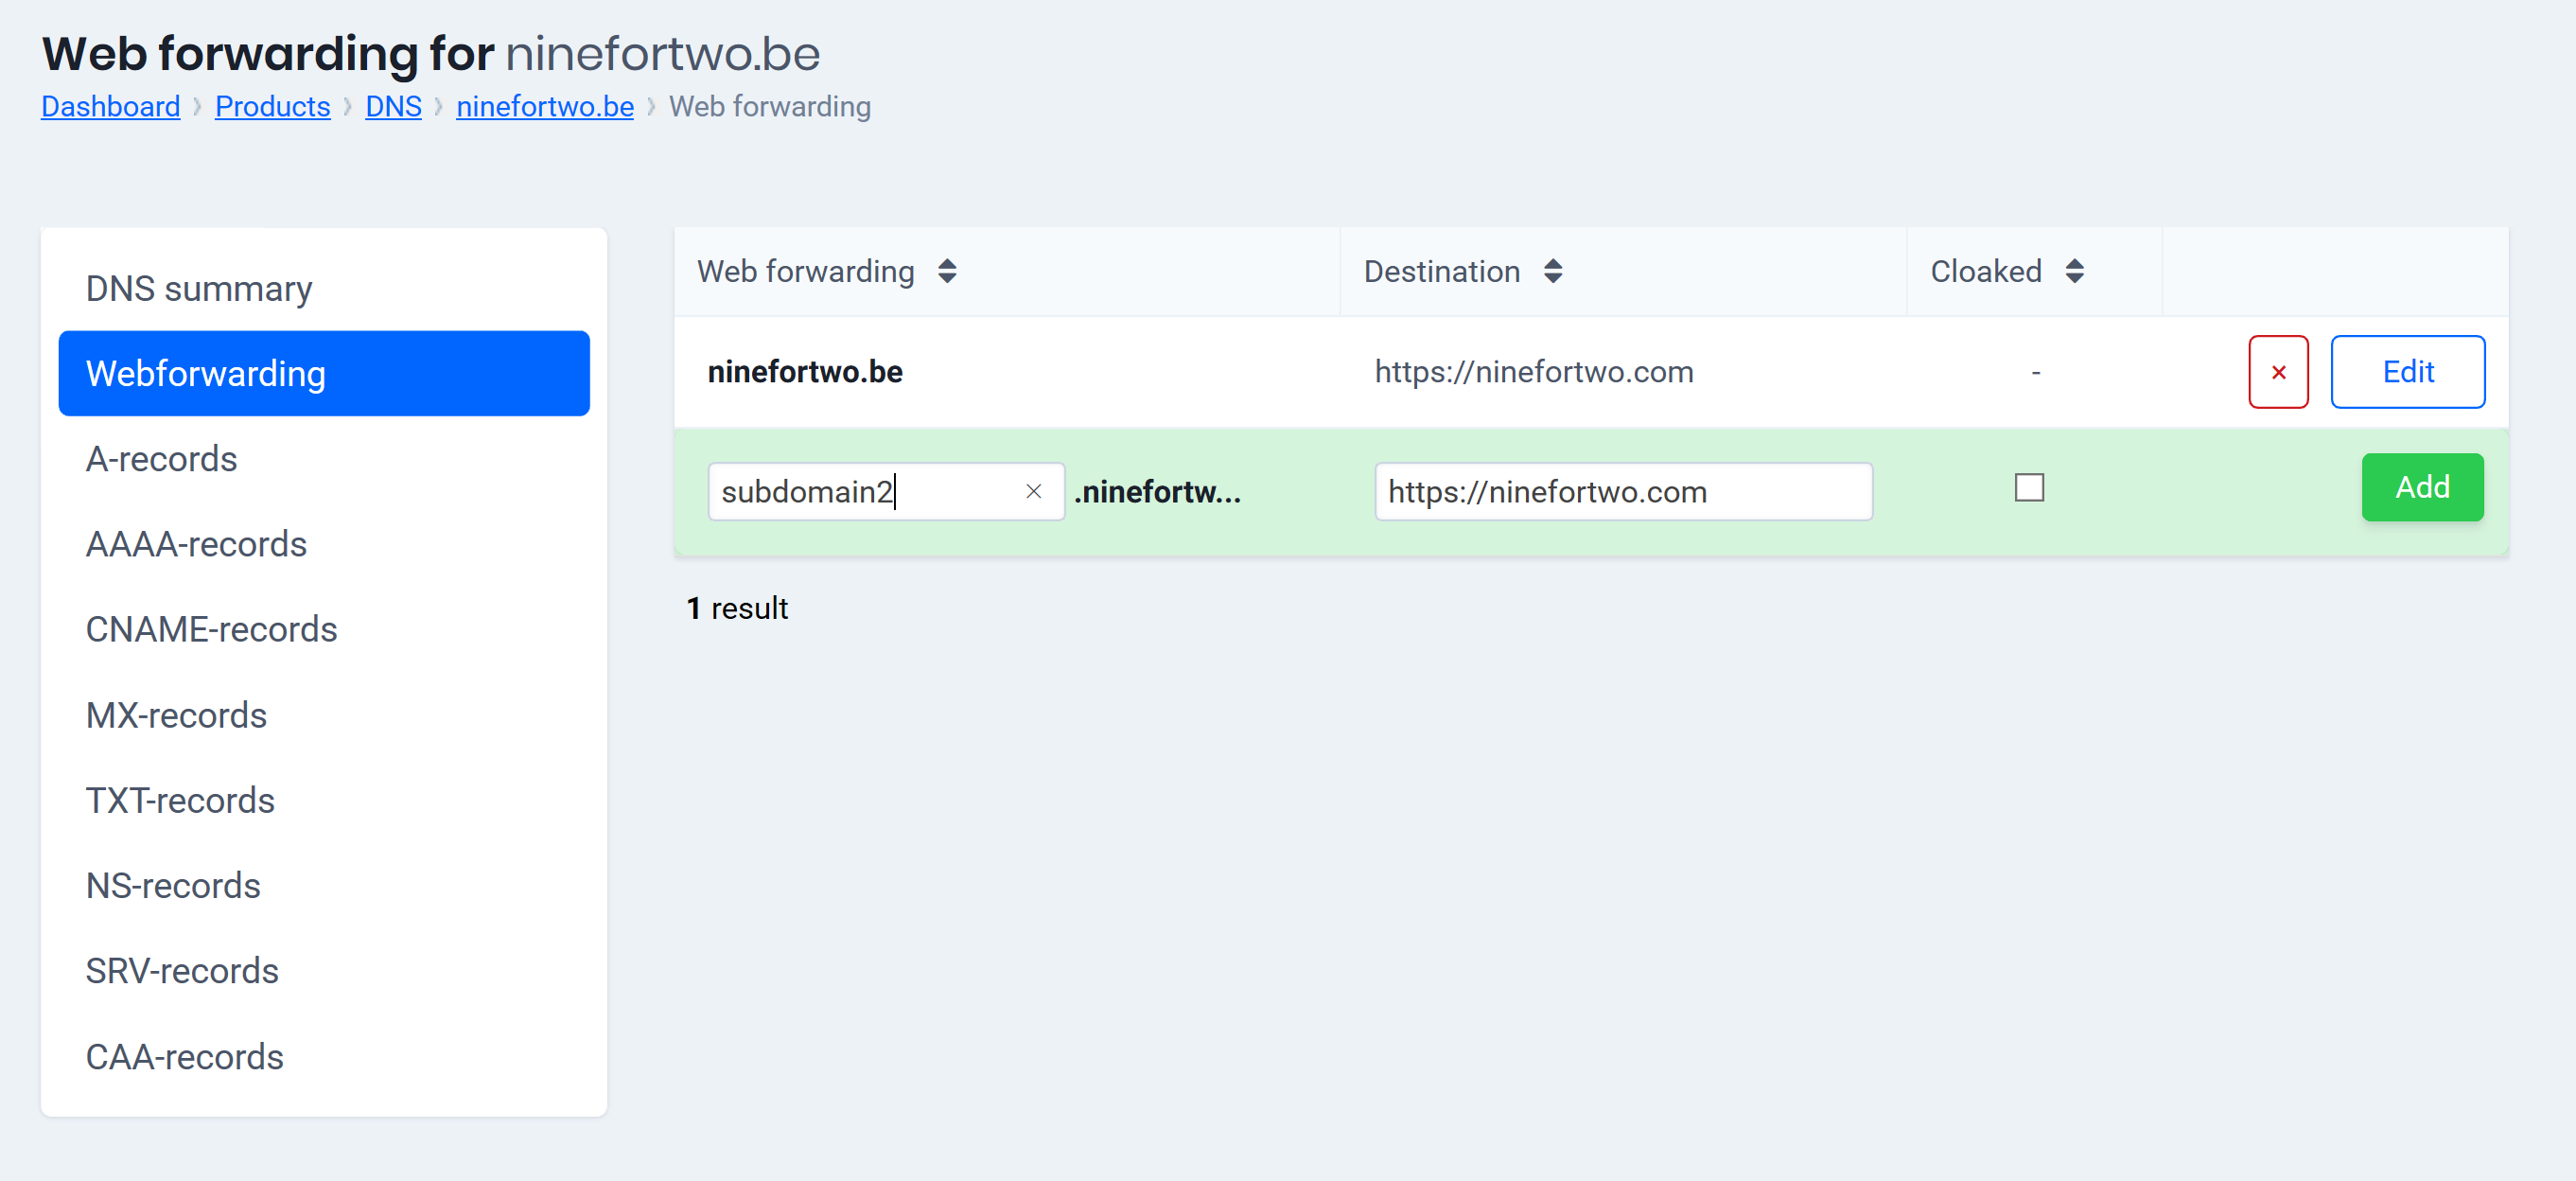 Webforwarding: advanced options